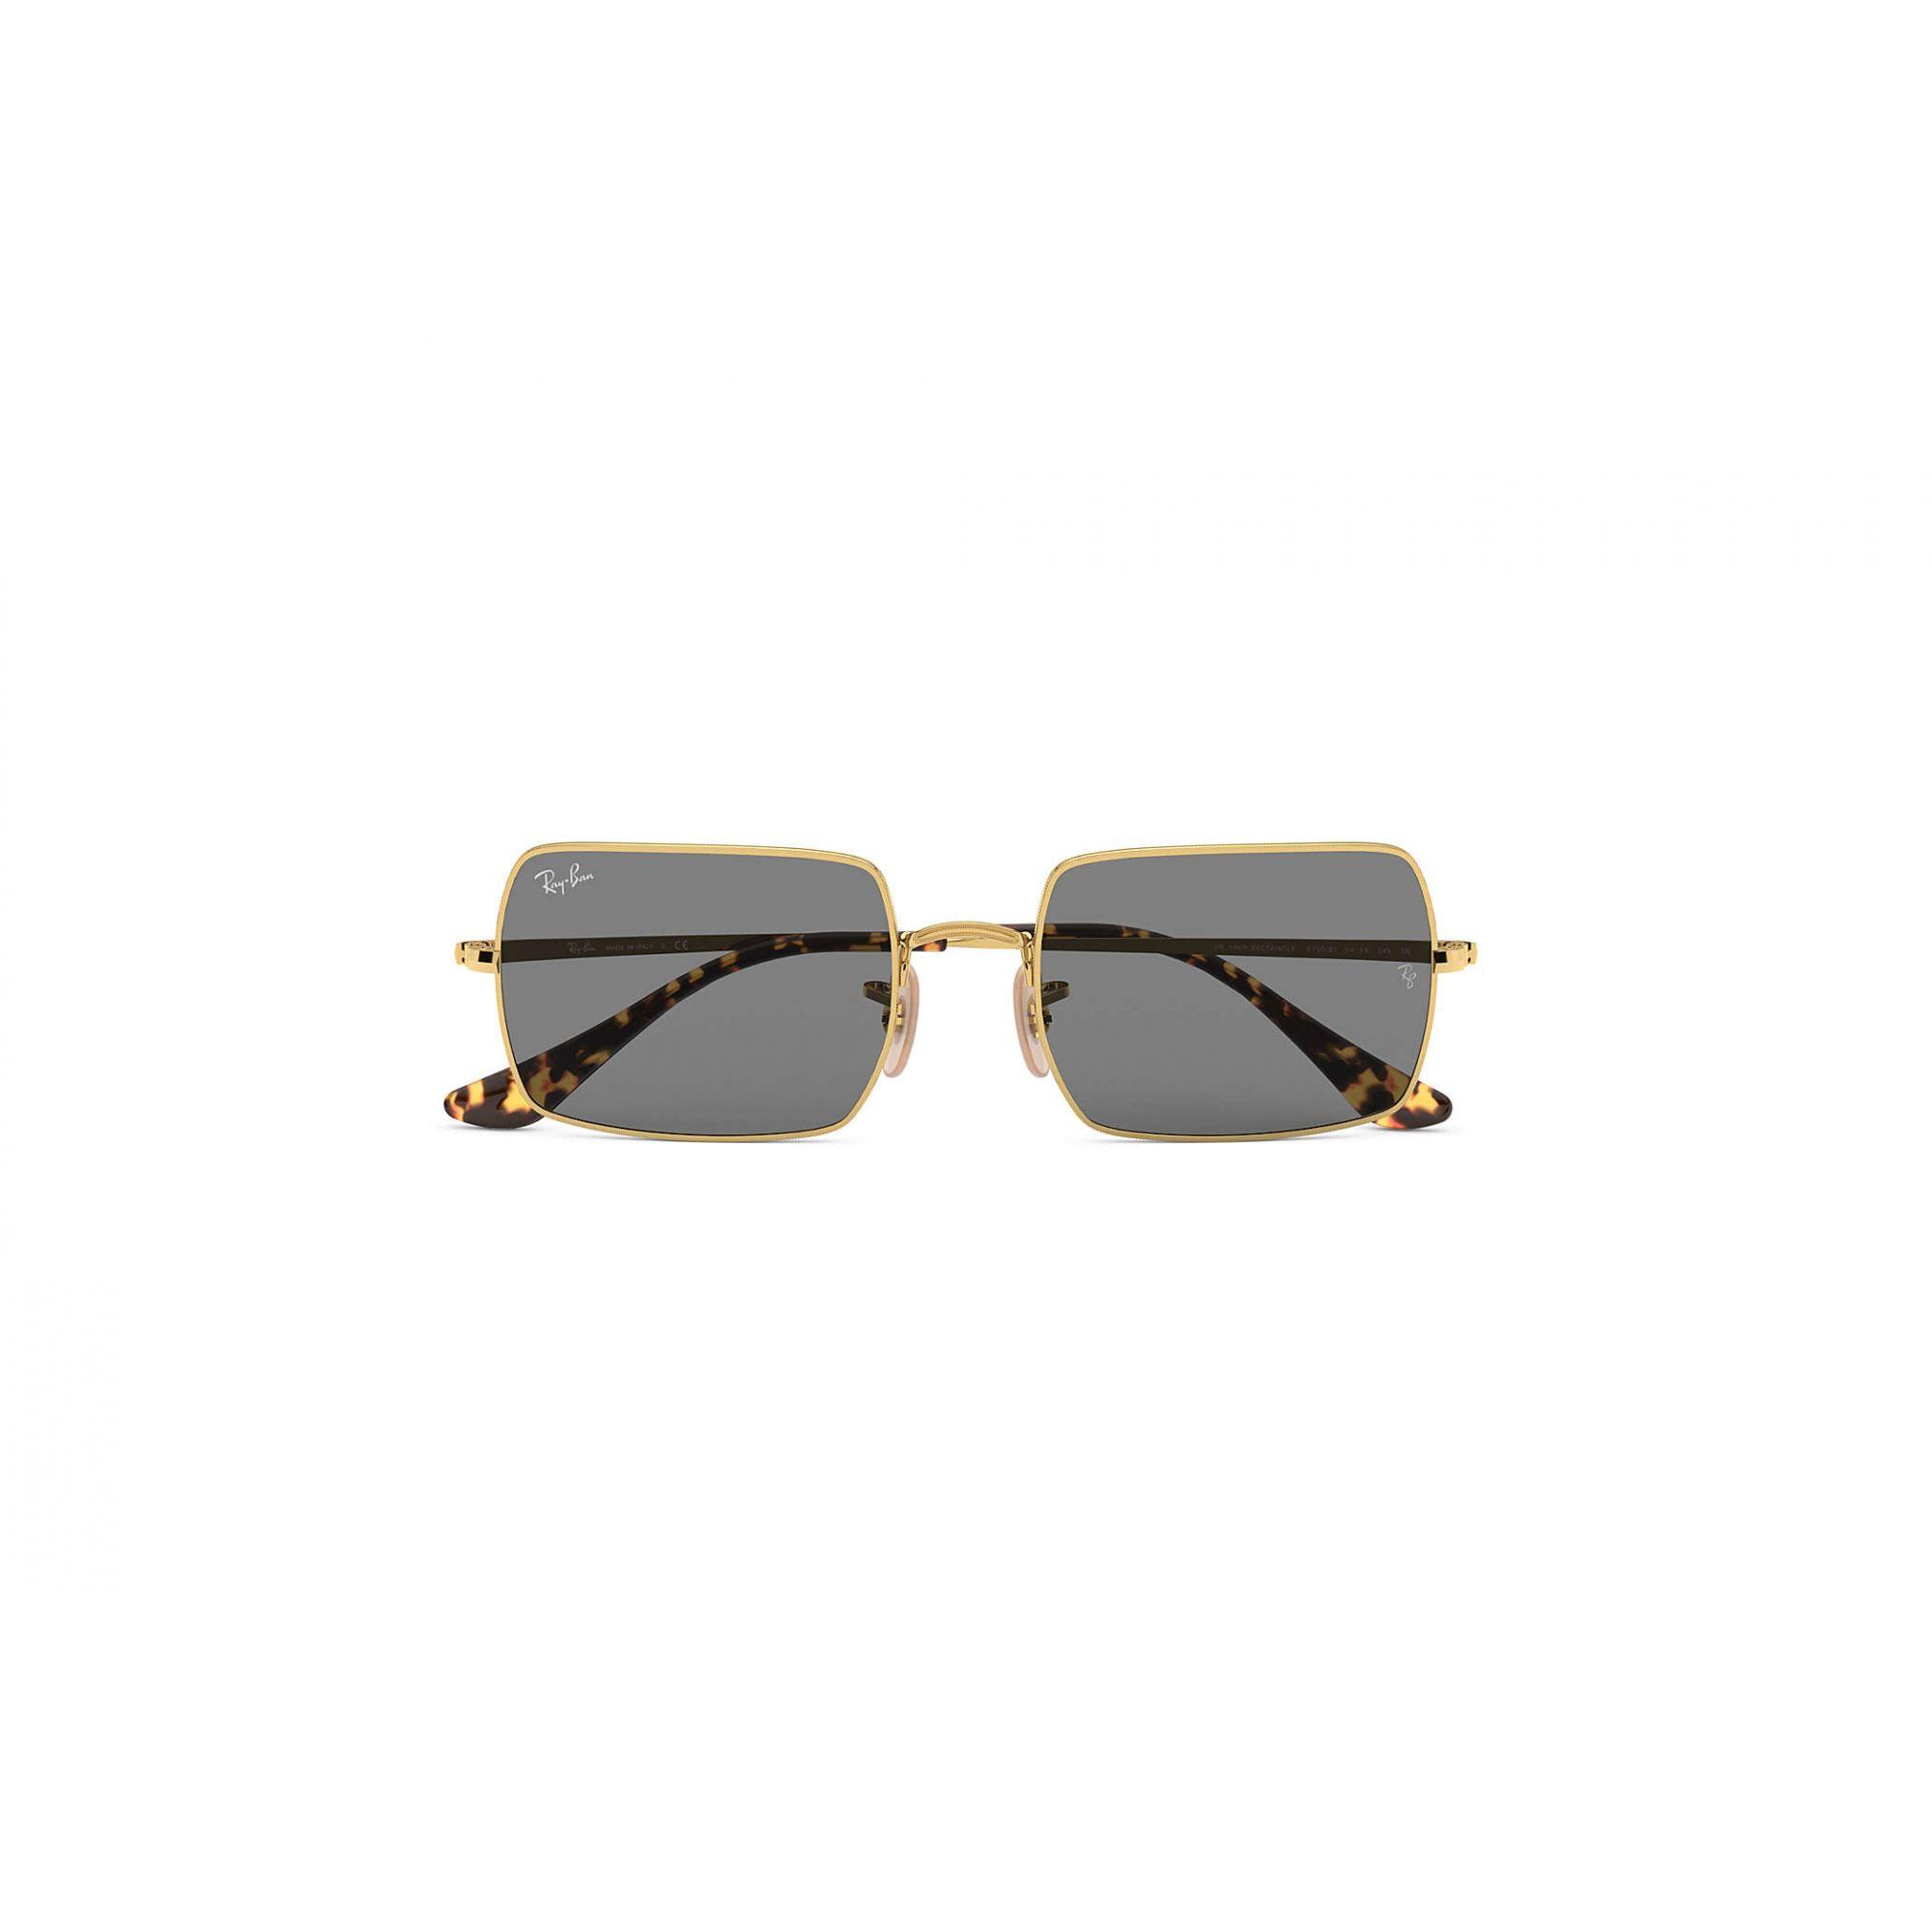 Ray Ban - RB1969 9150B1 - Óculos de sol